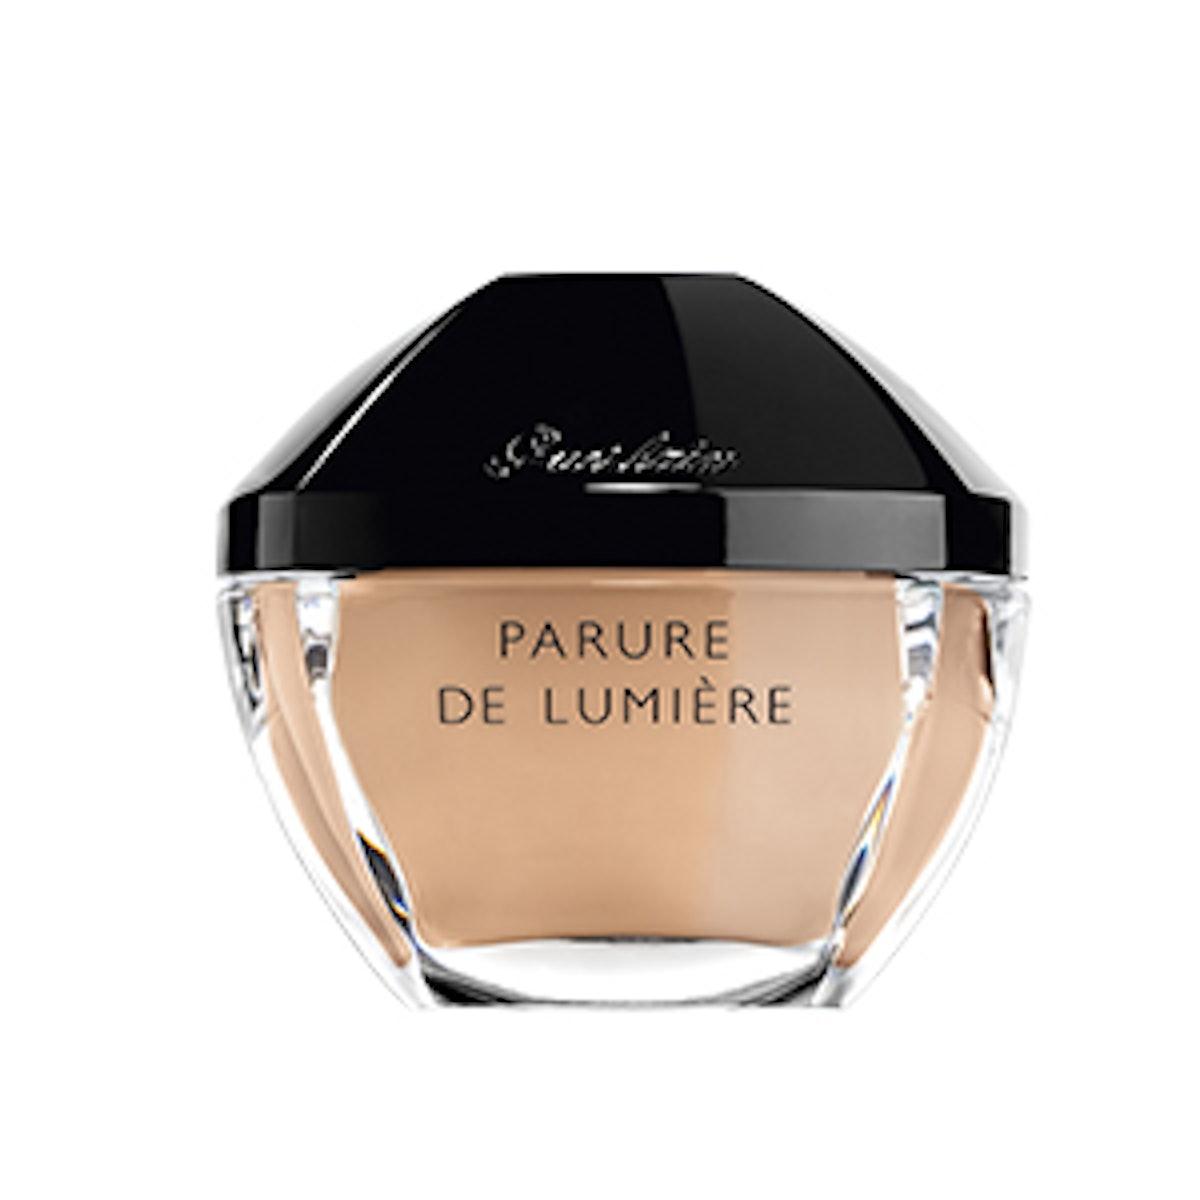 Parure De Lumiere Cream Foundation